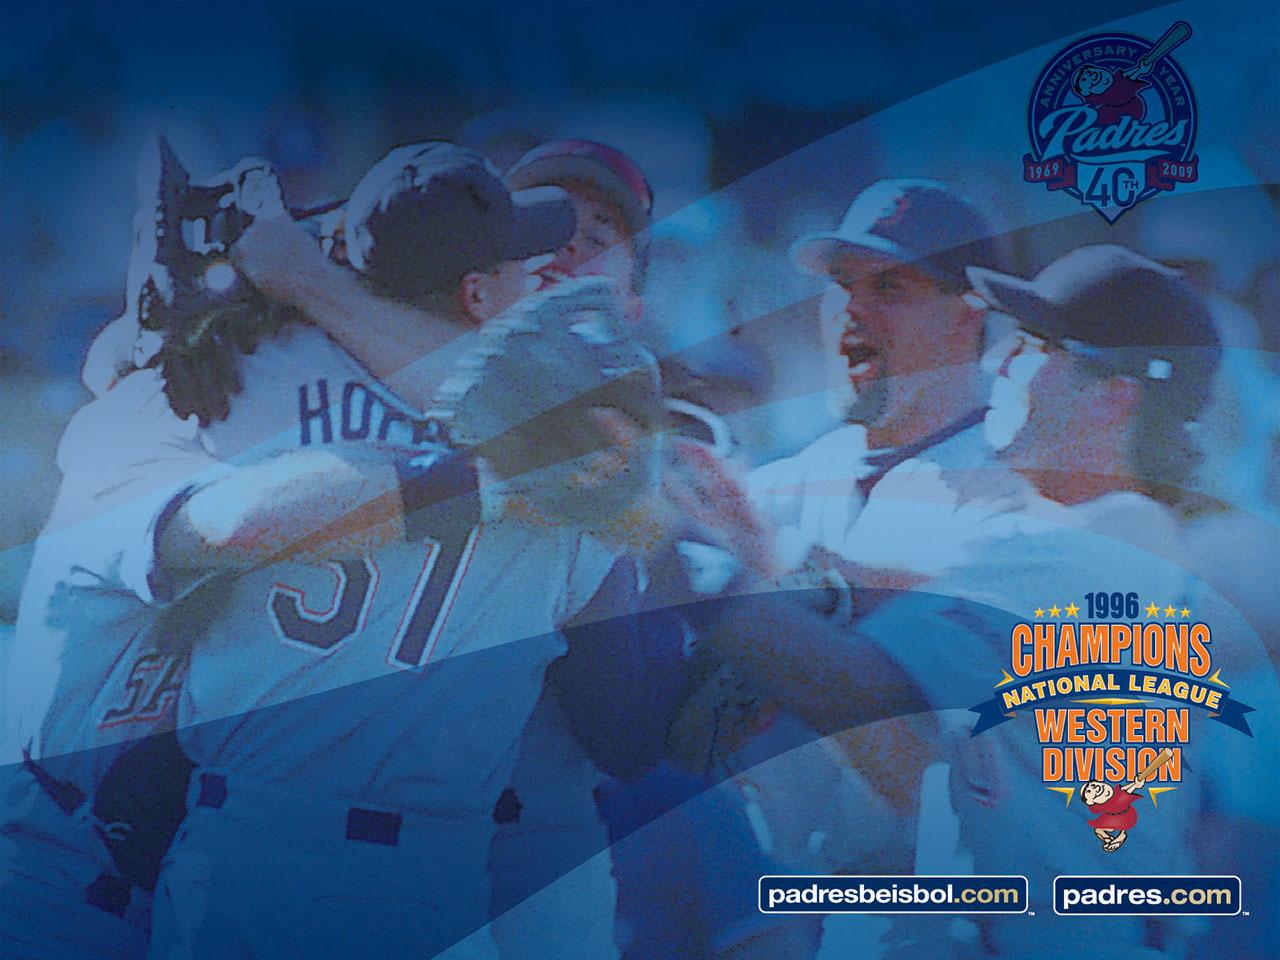 Download San Diego Padres wallpaper Padres Champions Wallpaper 1280x960